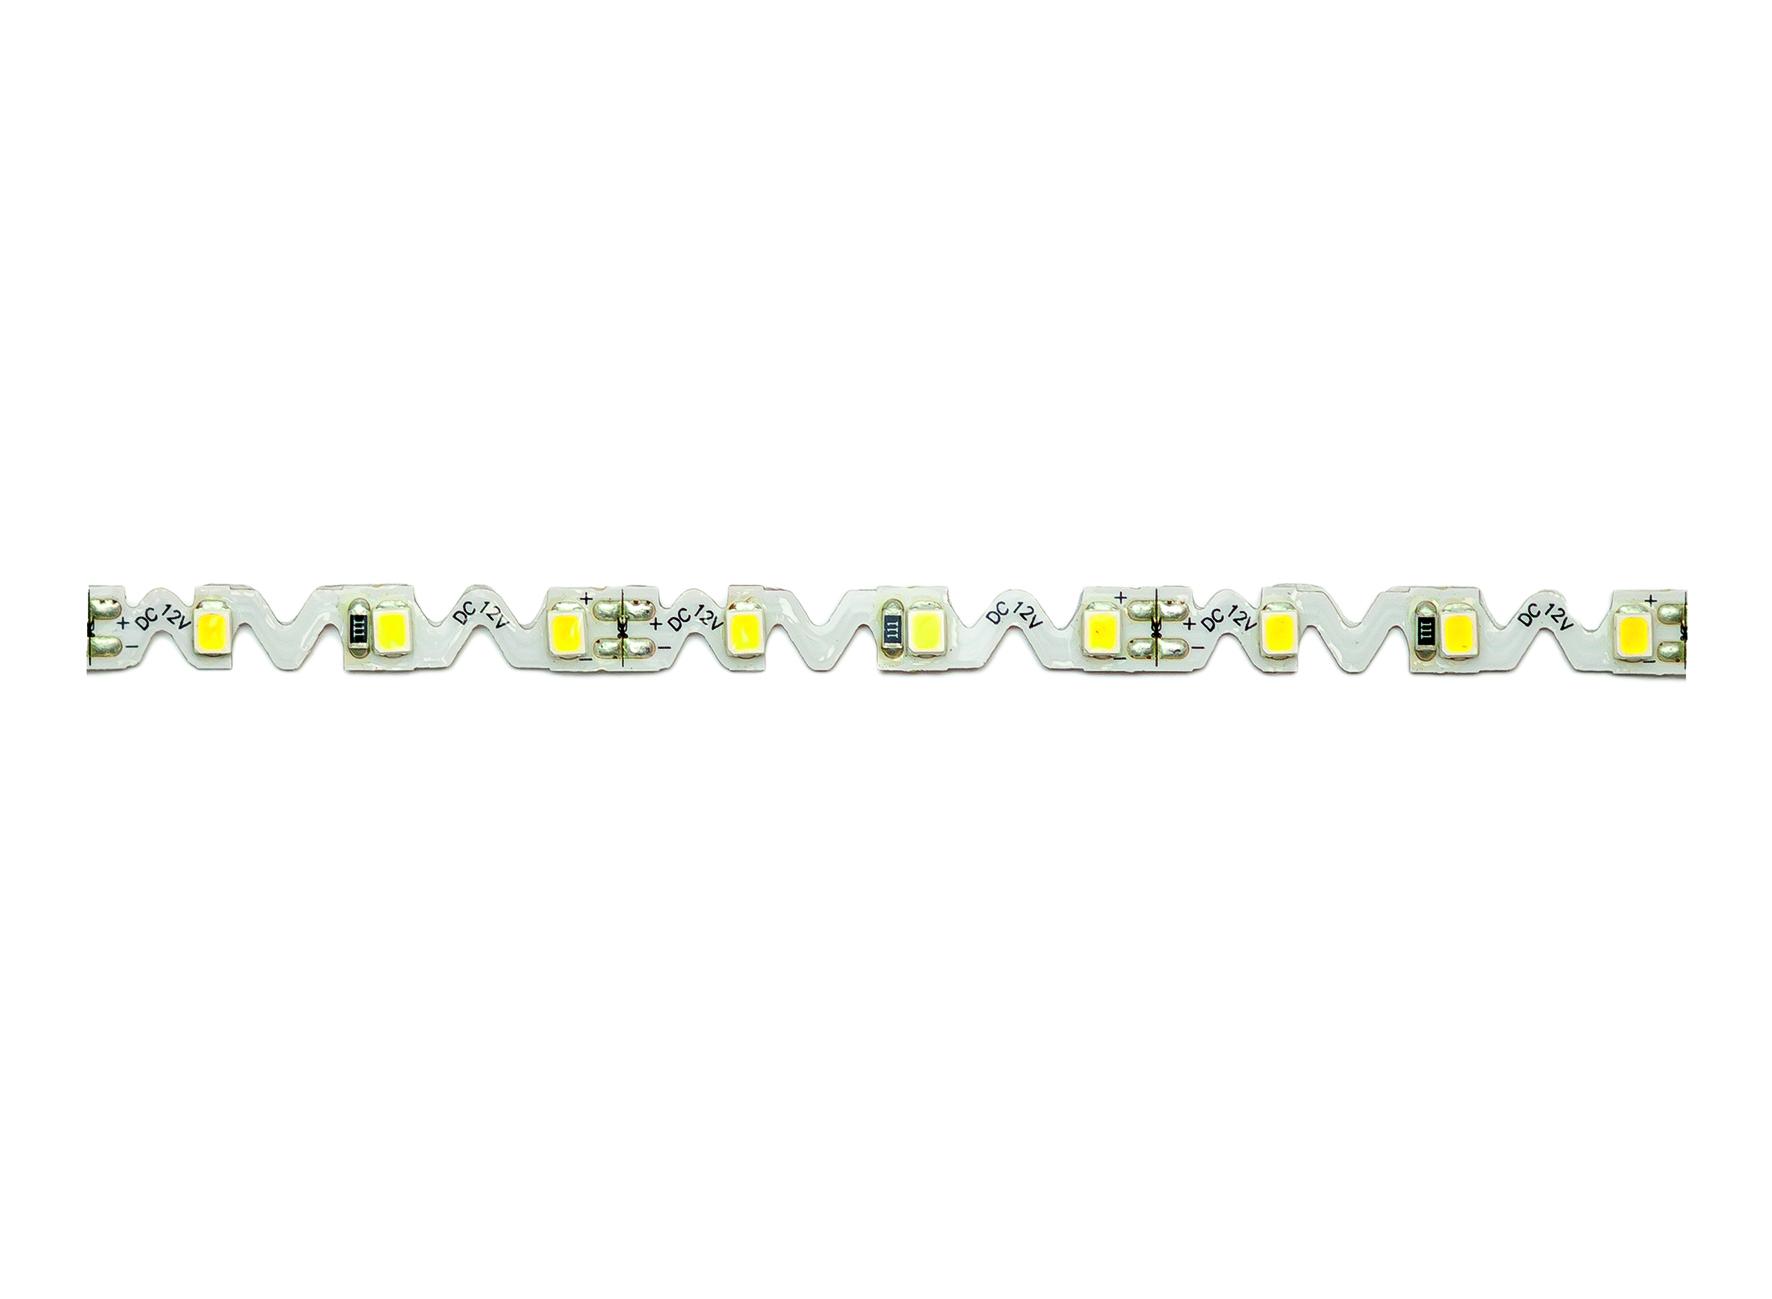 LED for sidelit lightbox - download the specs